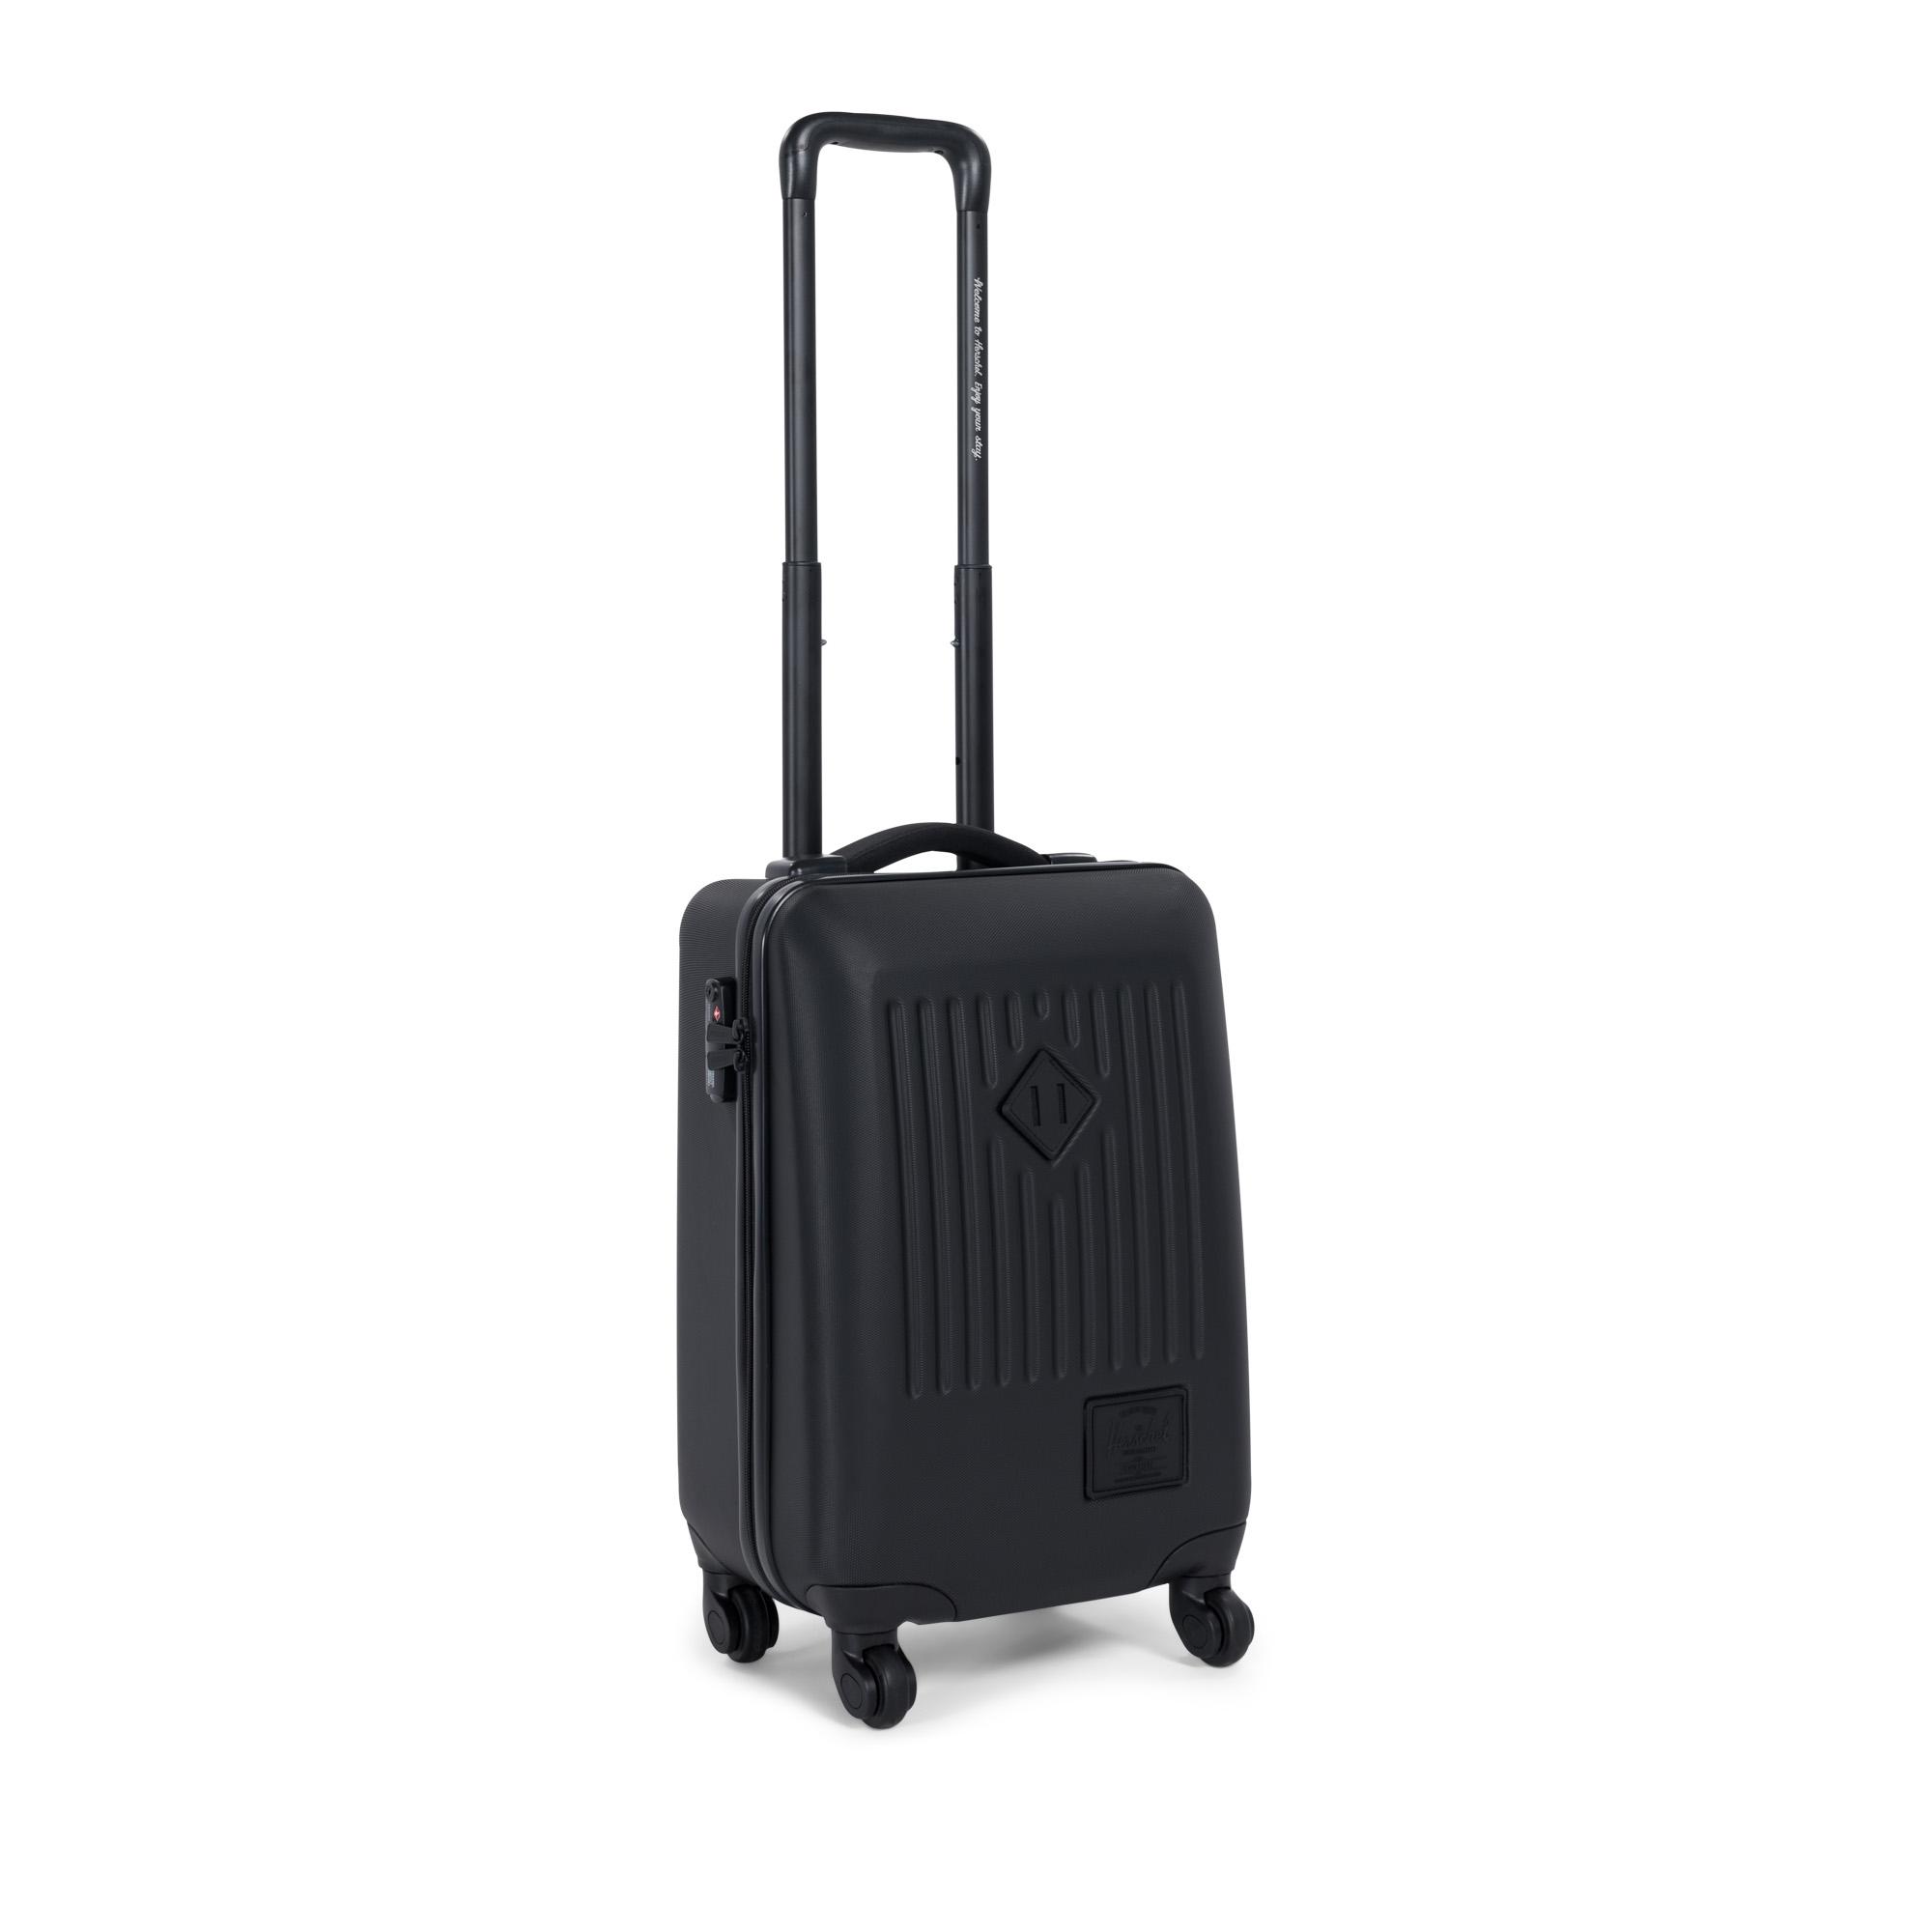 Herschel Koffer Rollkoffer Hartschalenkoffer Trade Carry on Travel Black 10336-01587 F18-HT1